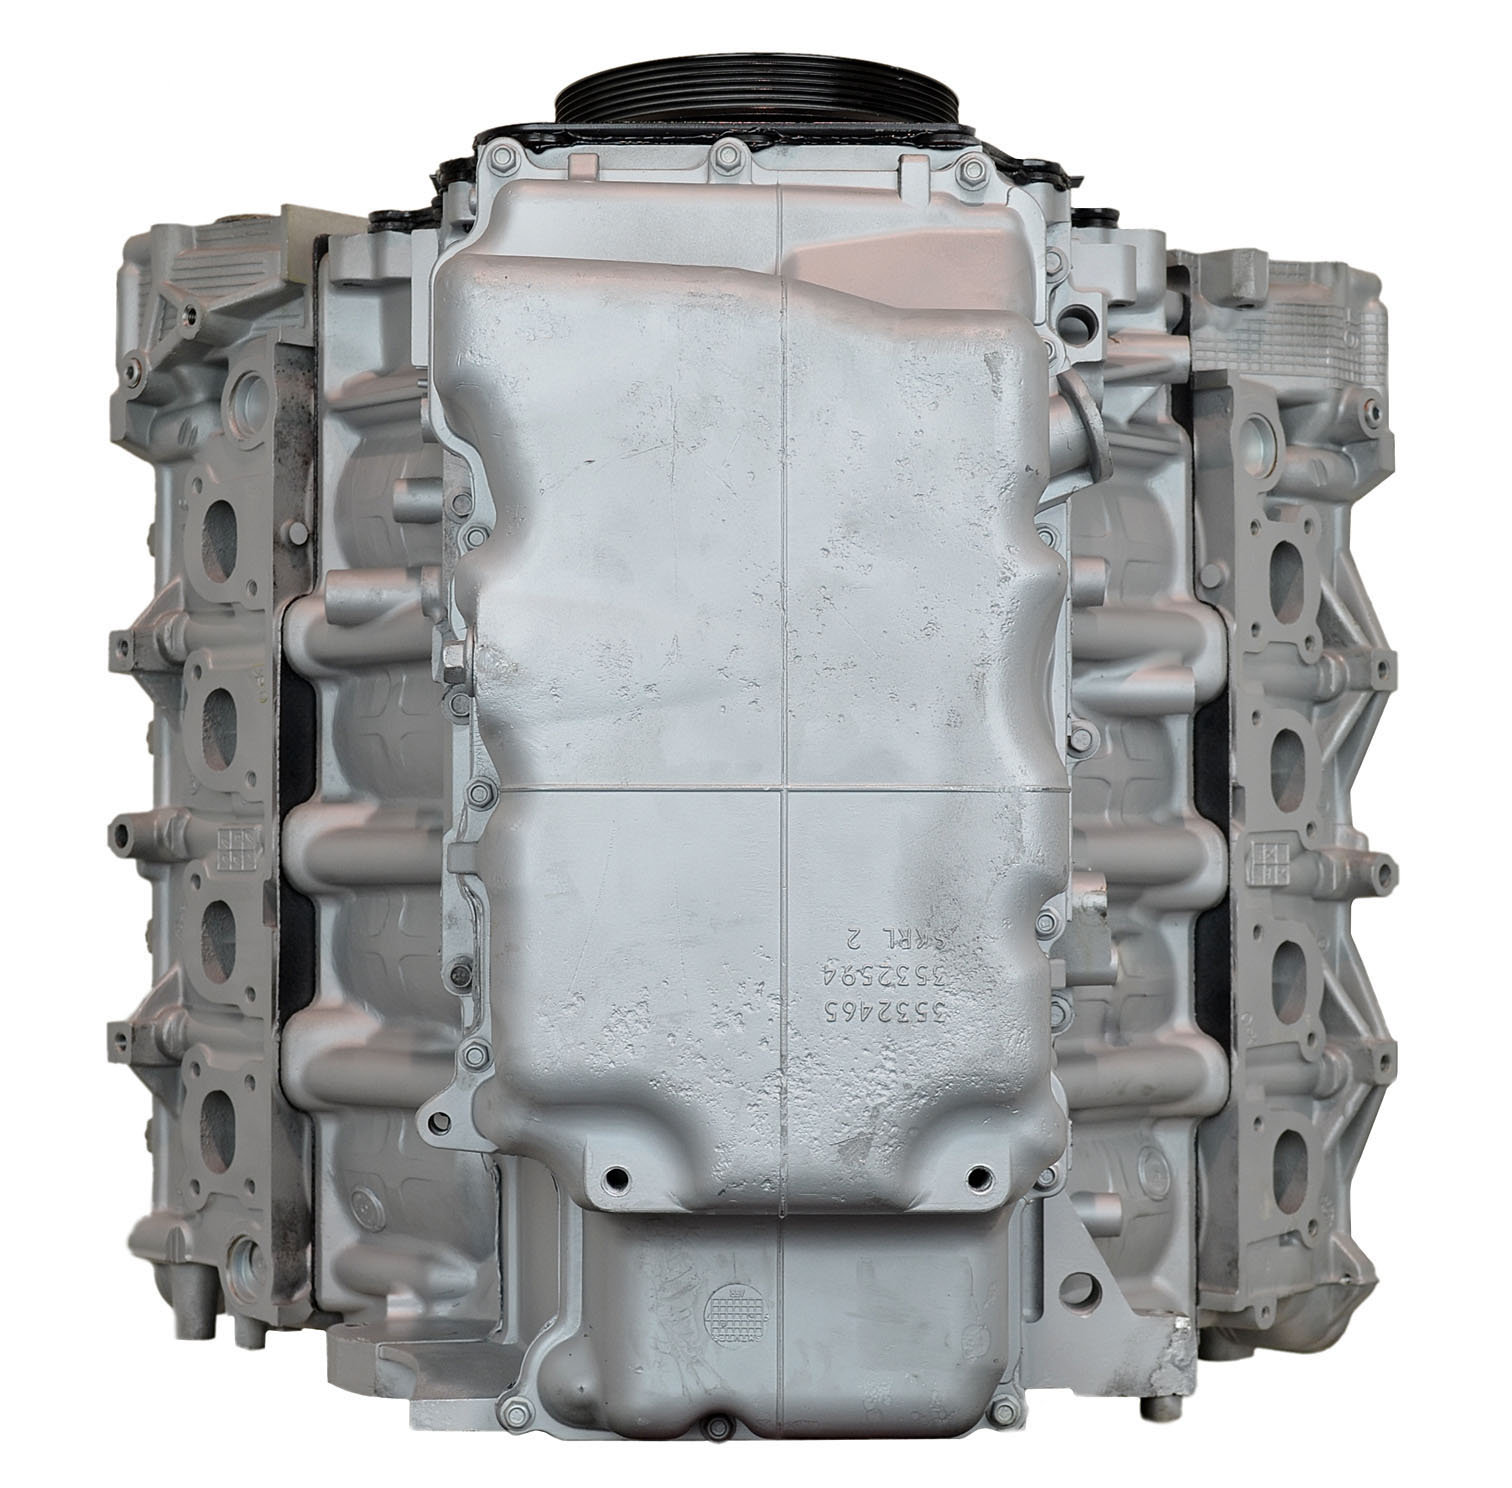 96-99 Cadillac Deville 4.6 NorthStar Engine VIN 9